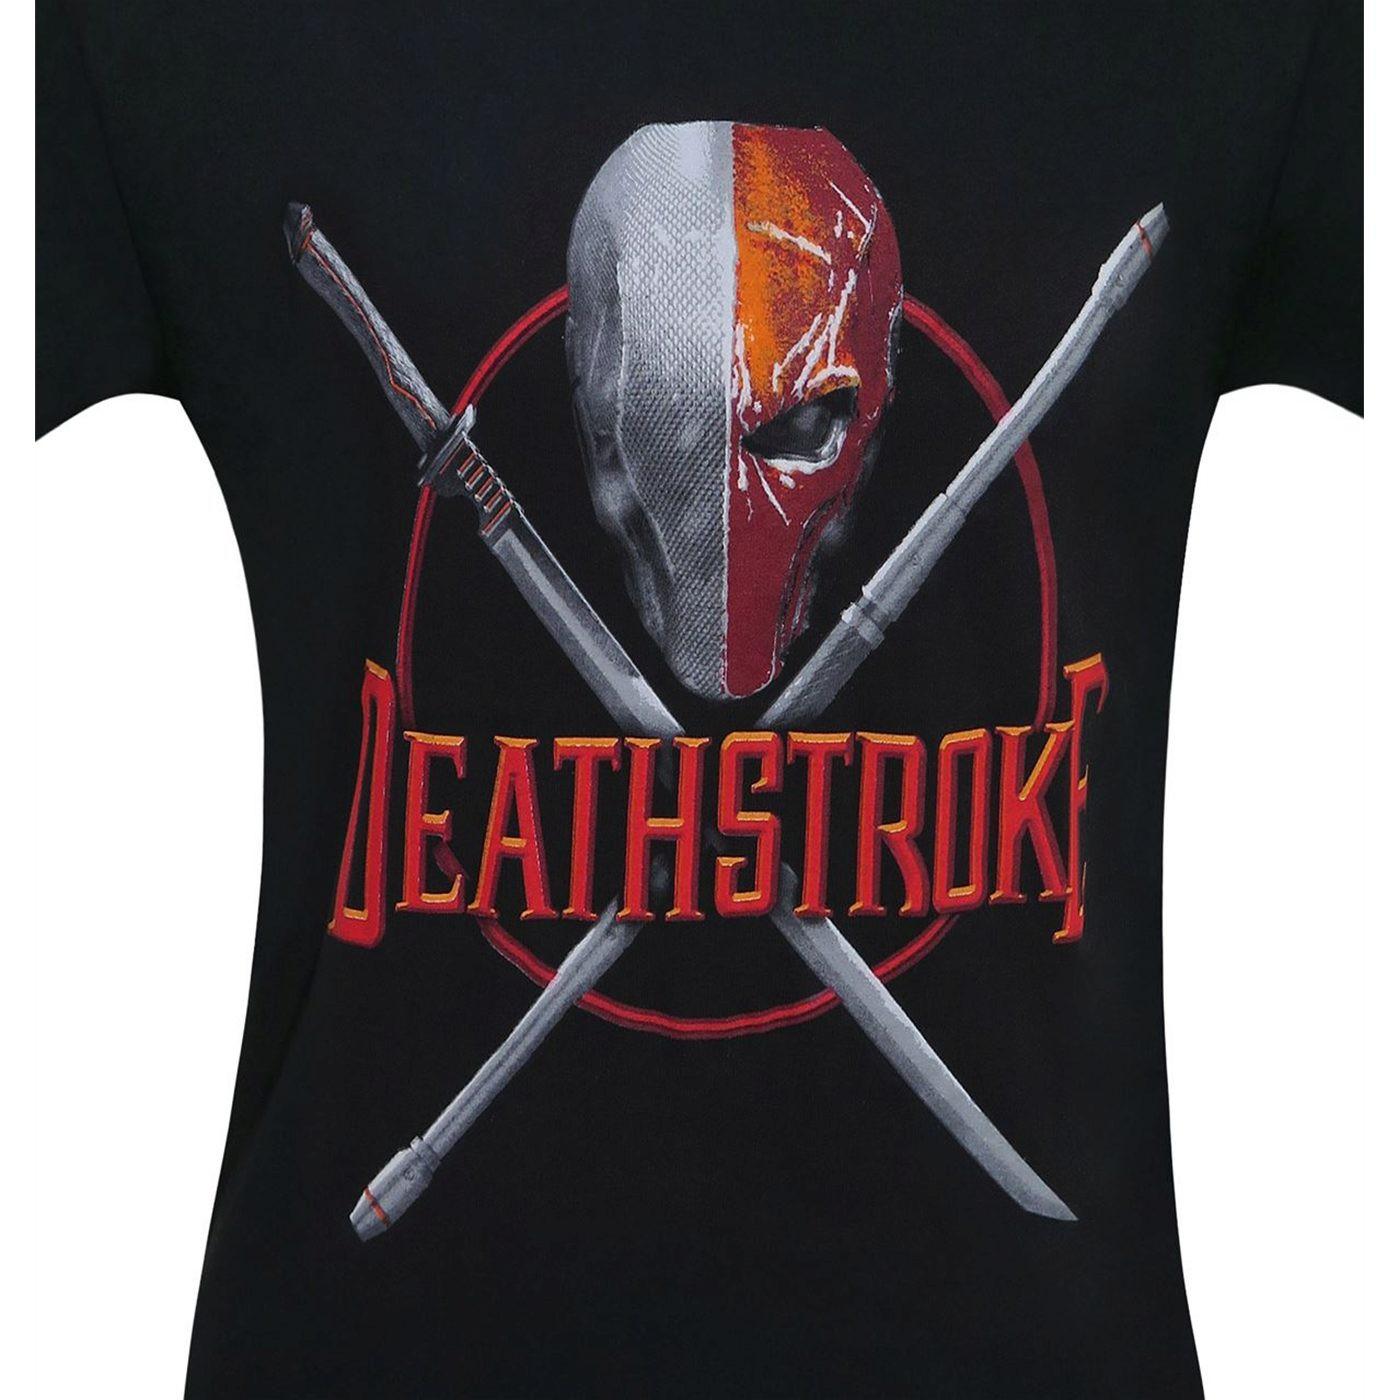 Deathstroke Weapons Crossed Men's T-Shirt